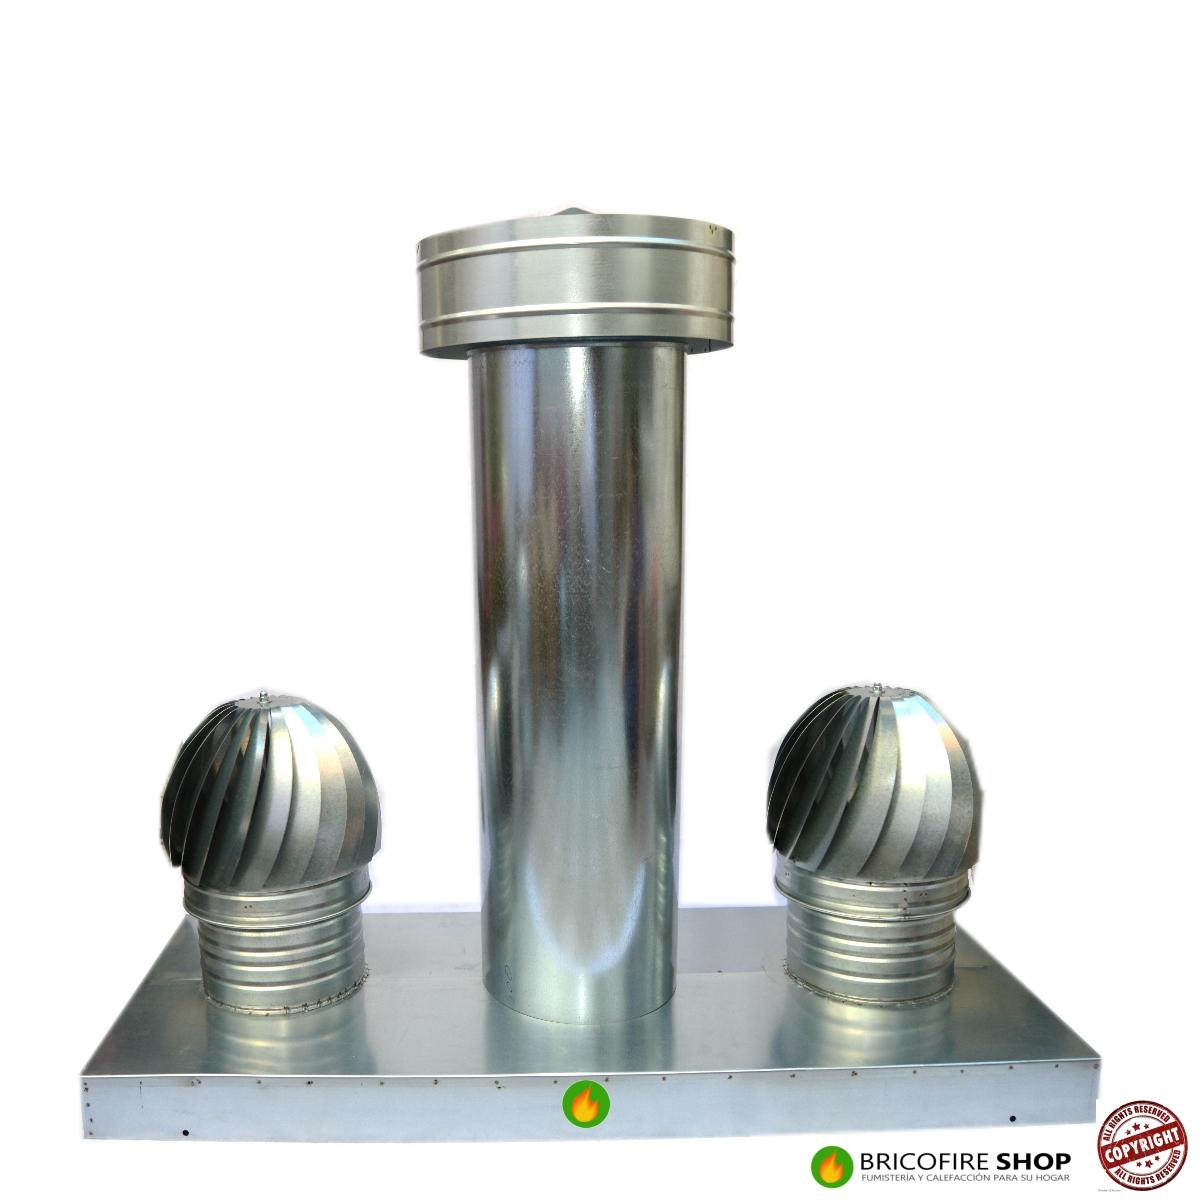 Caja aspiracion con dos aspiradores y antirrevoco con tubo